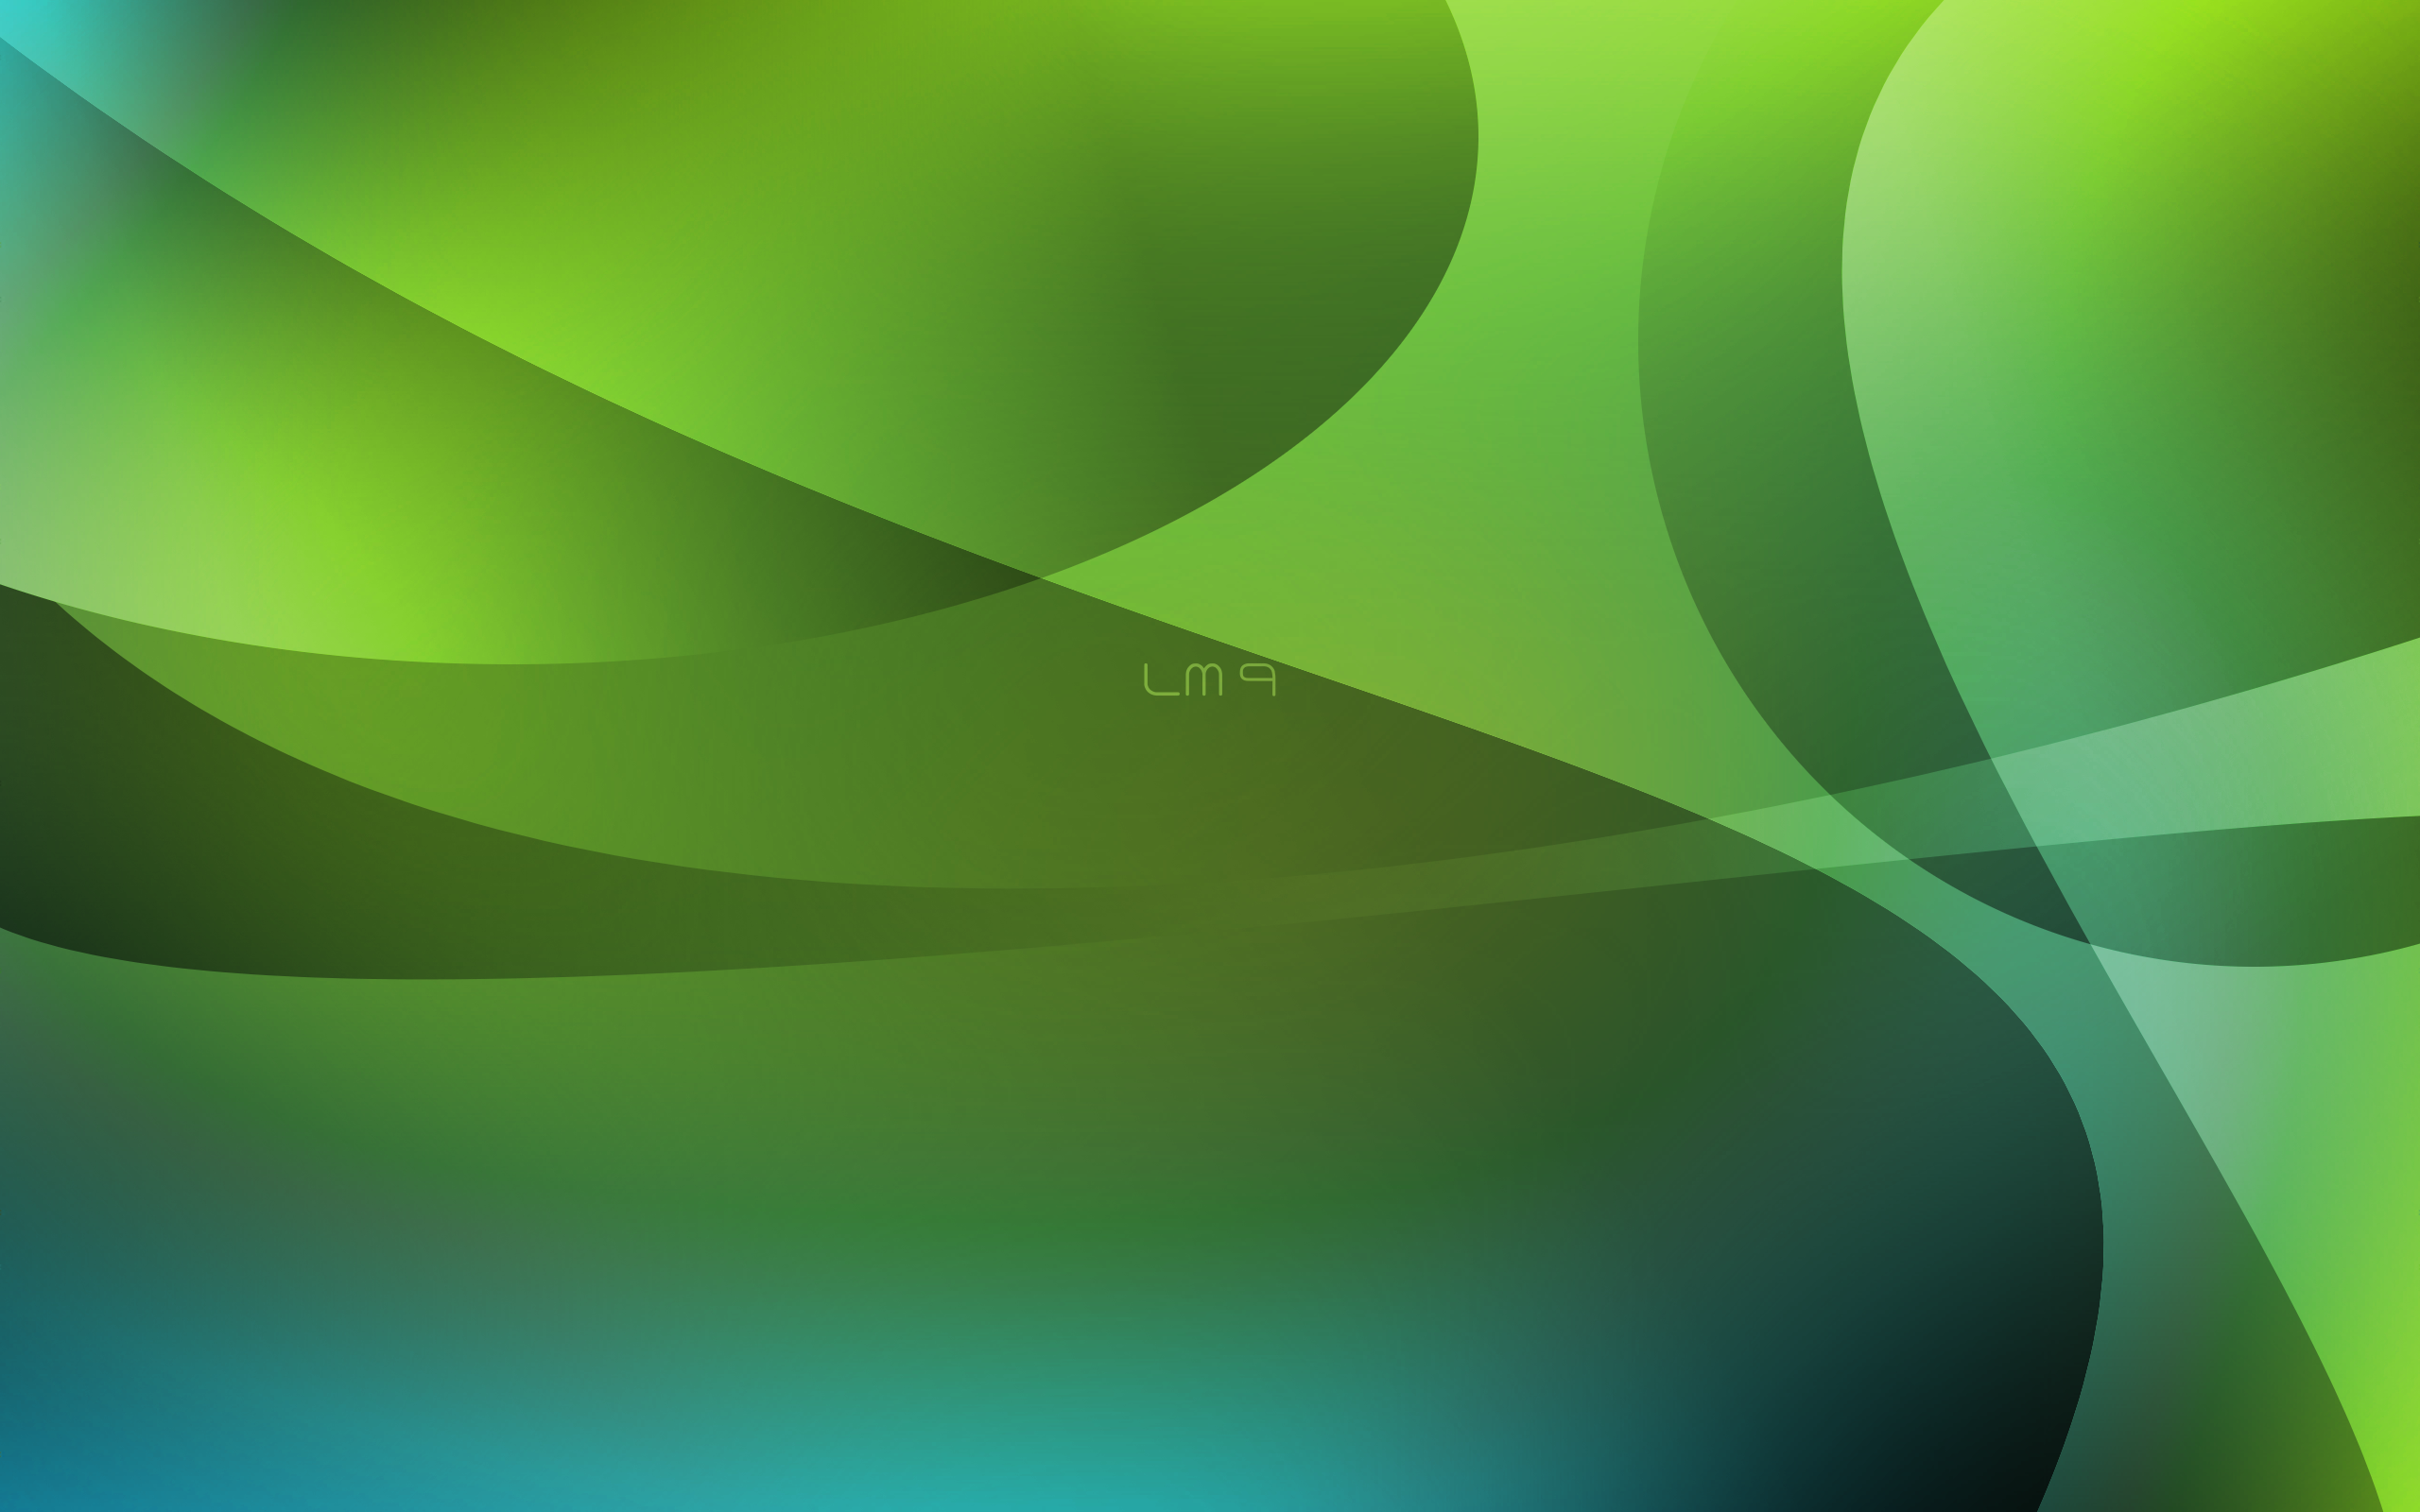 Linux Mint 9 Desktop Backgrounds The Blog